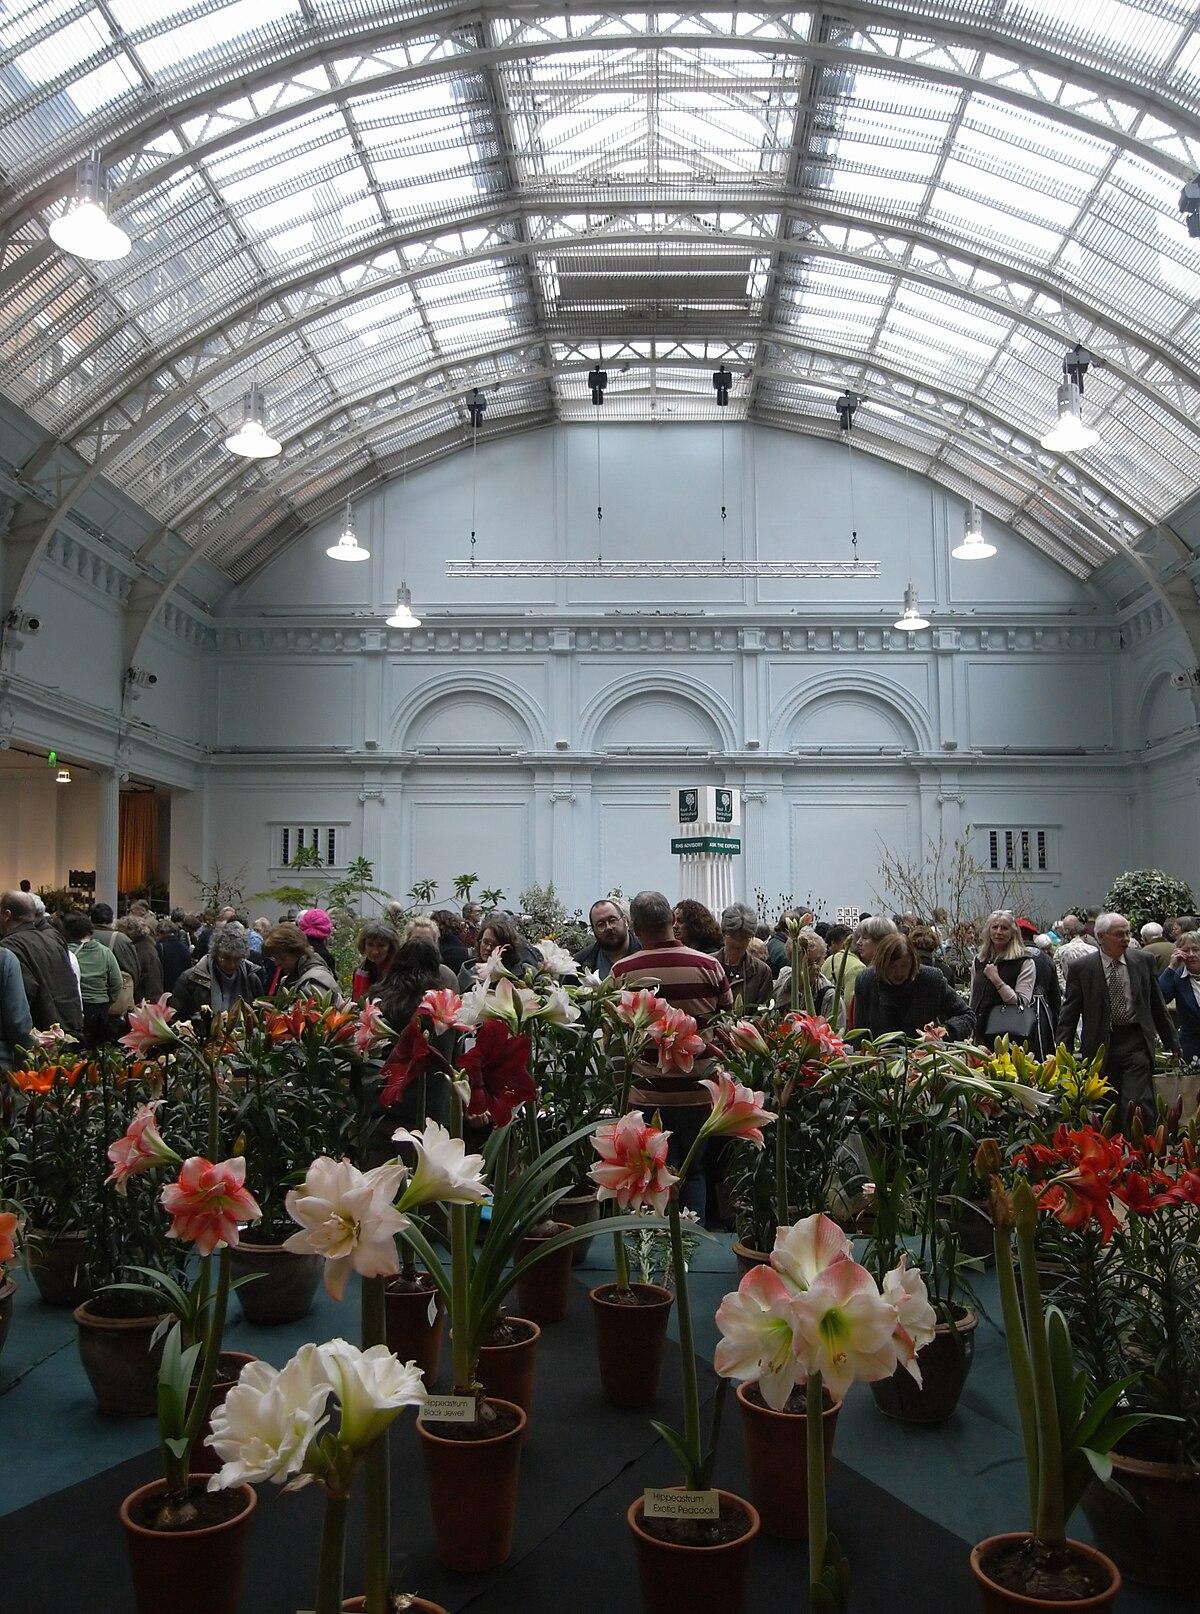 Lindley Hall London  Wikipedia